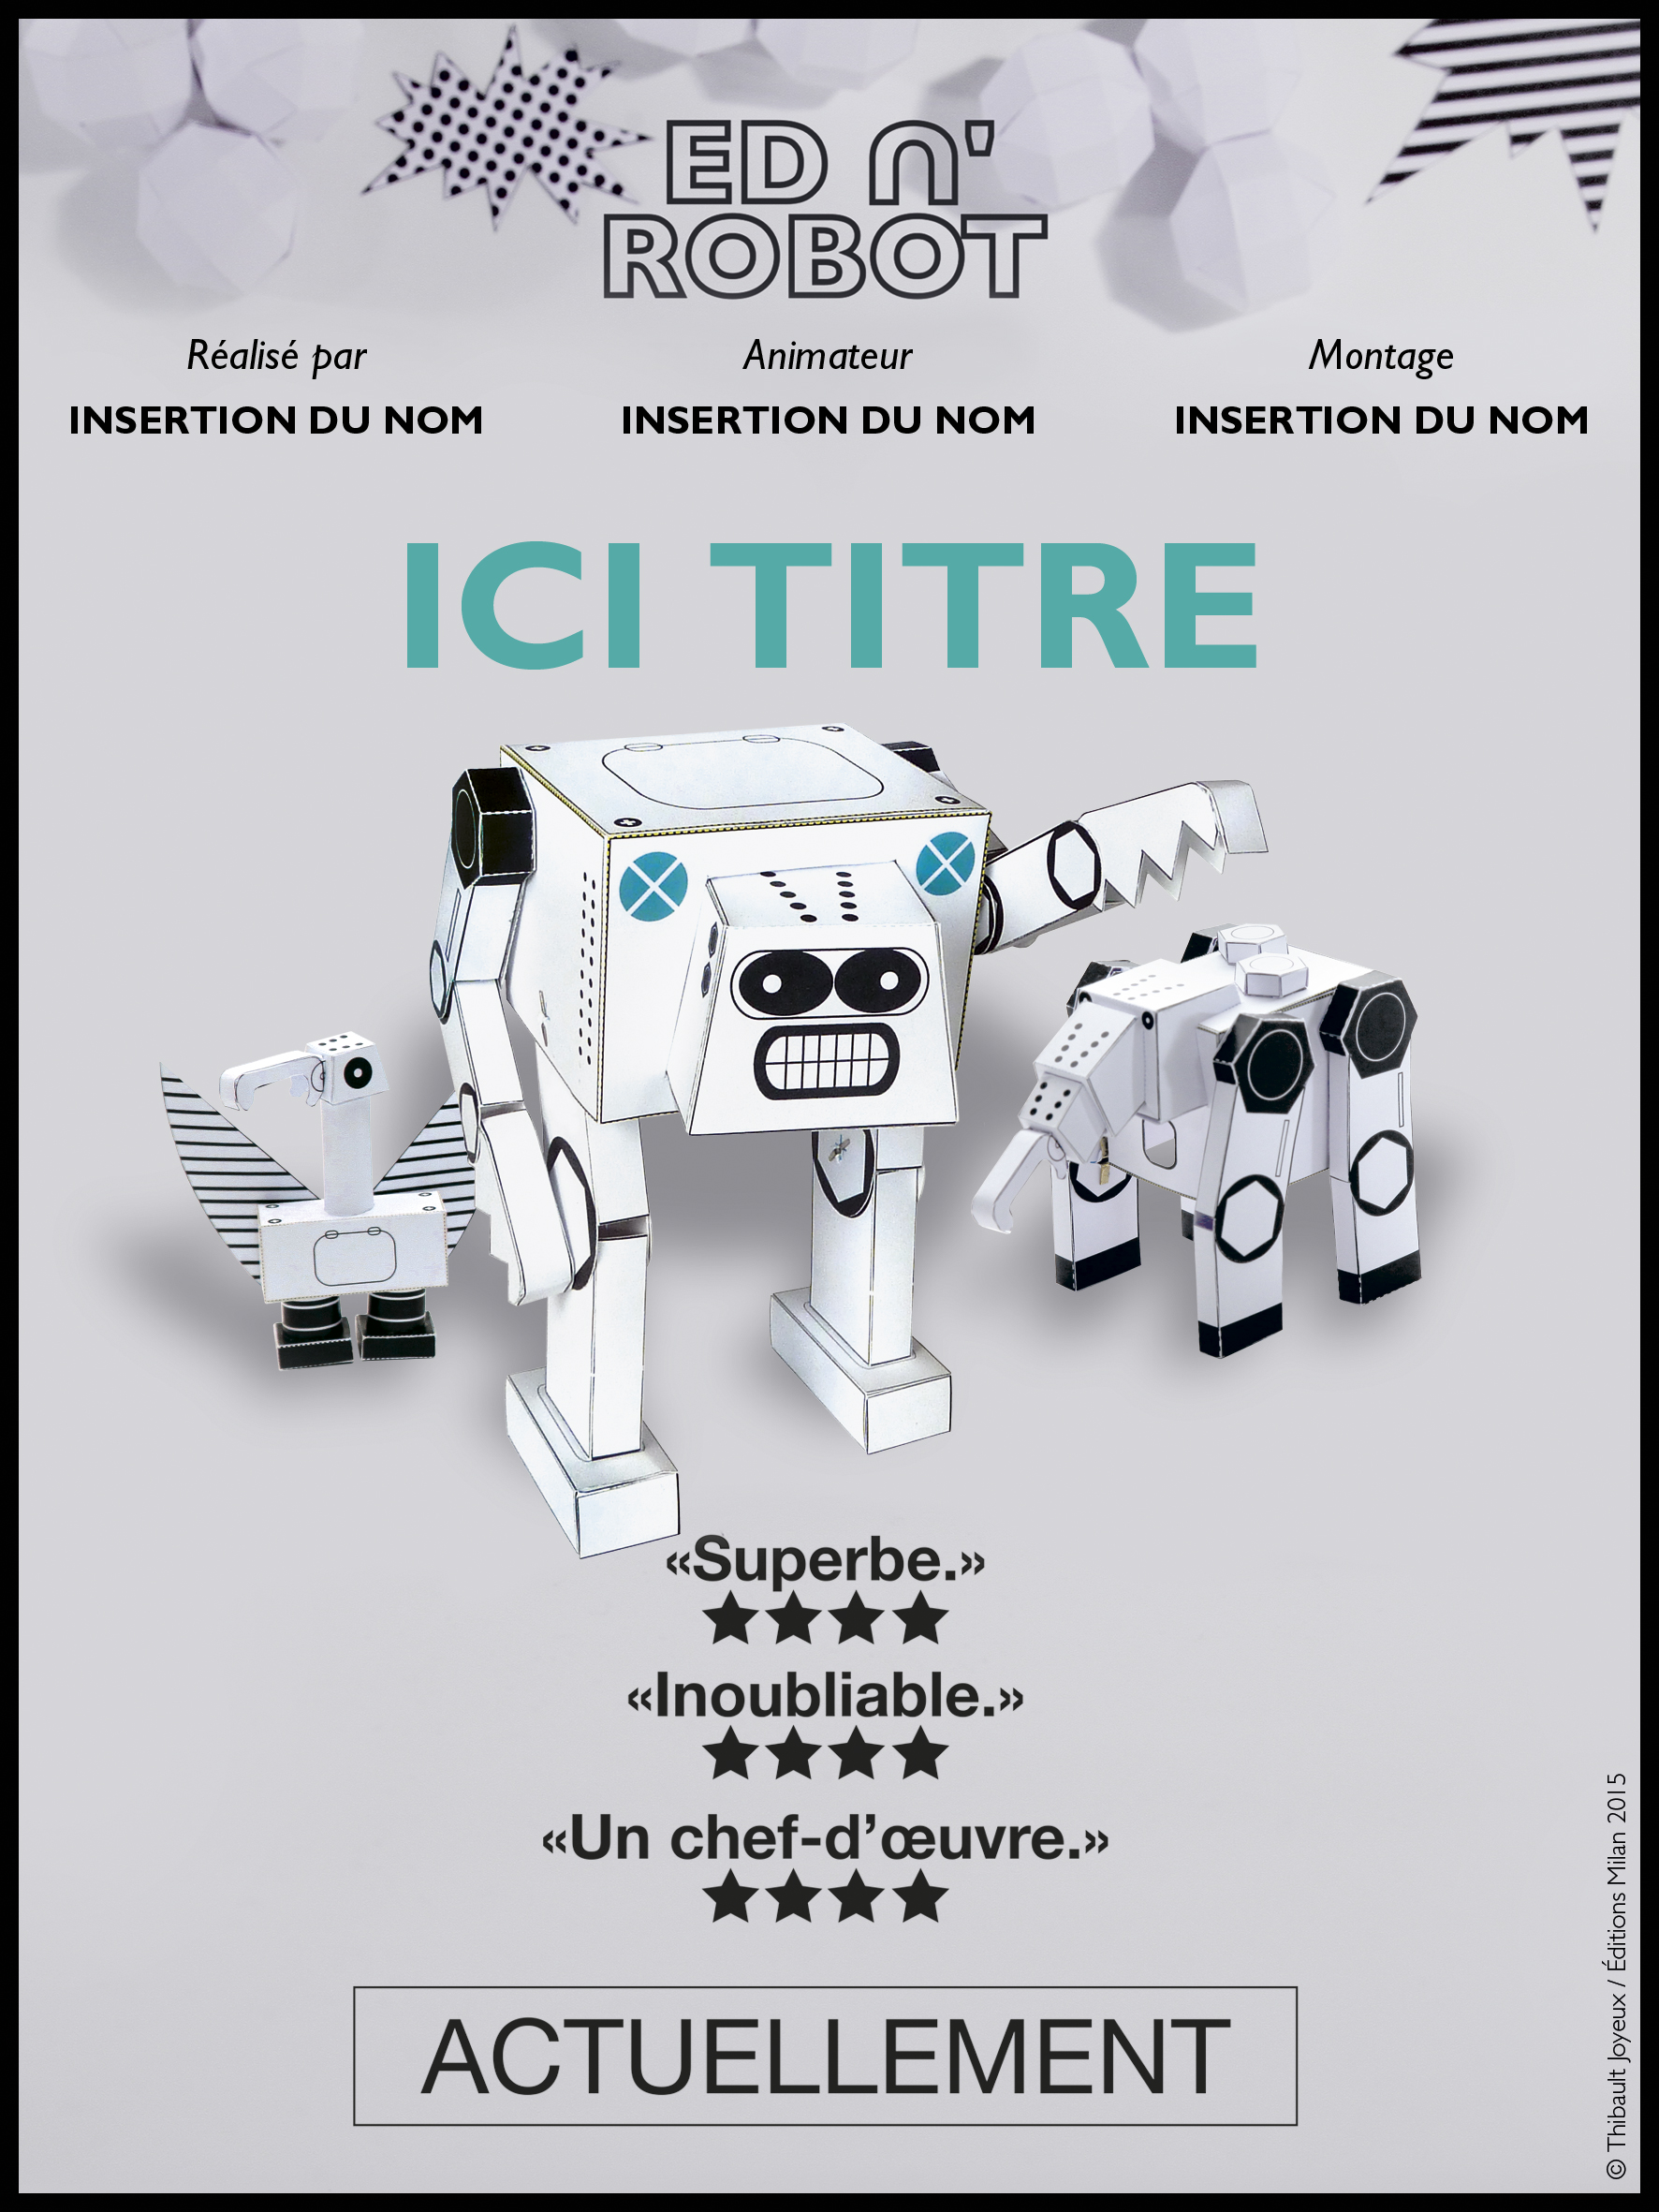 Ed n'Robot - Affiche 1